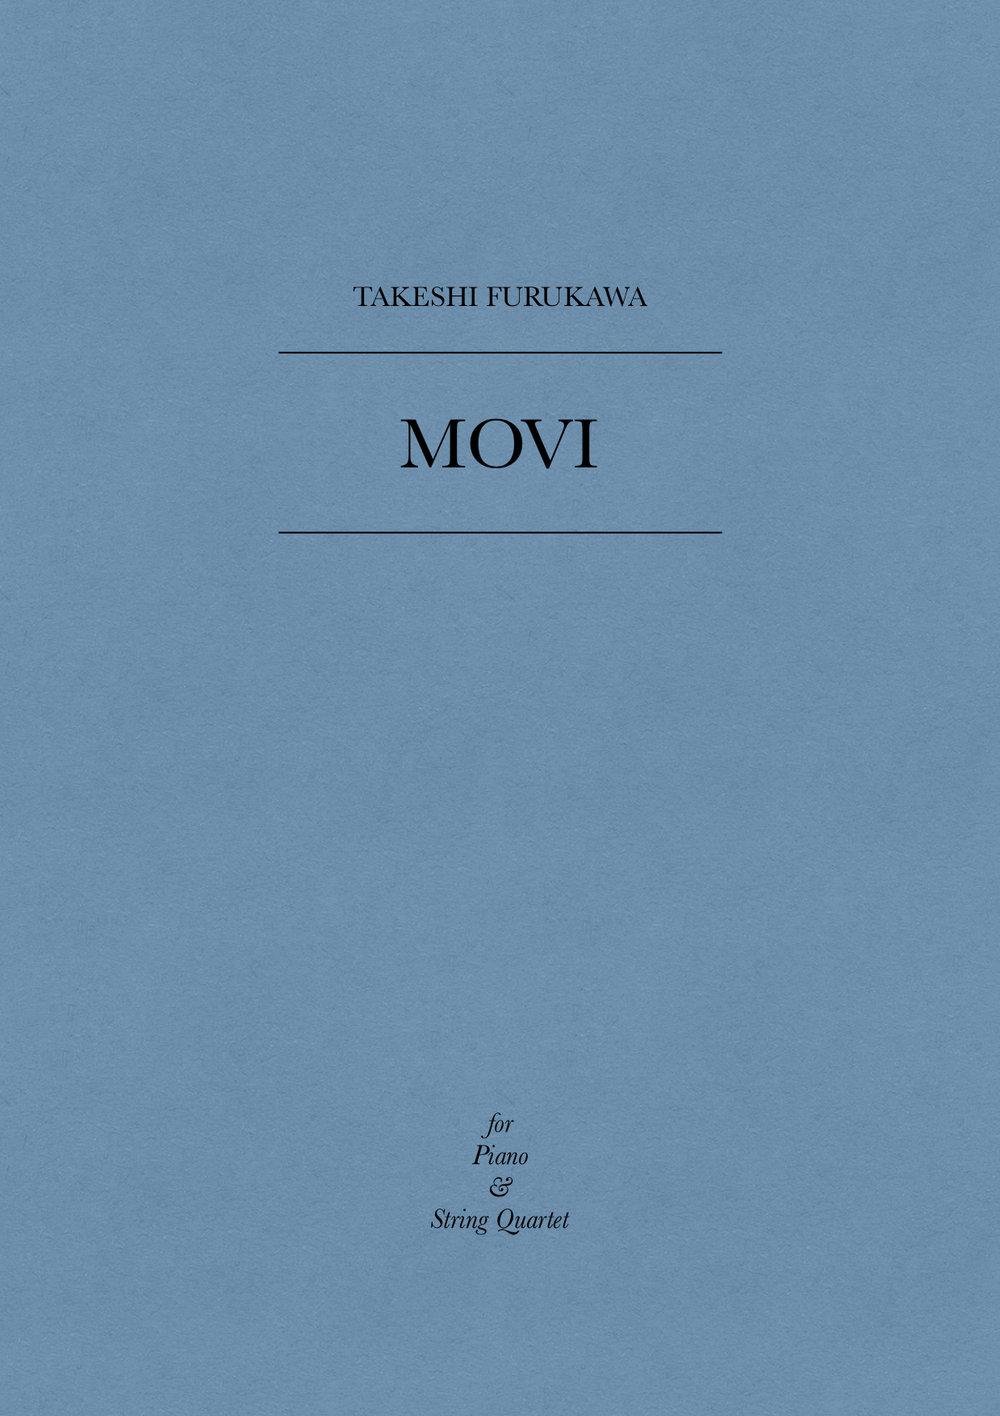 Movi Cover.jpg